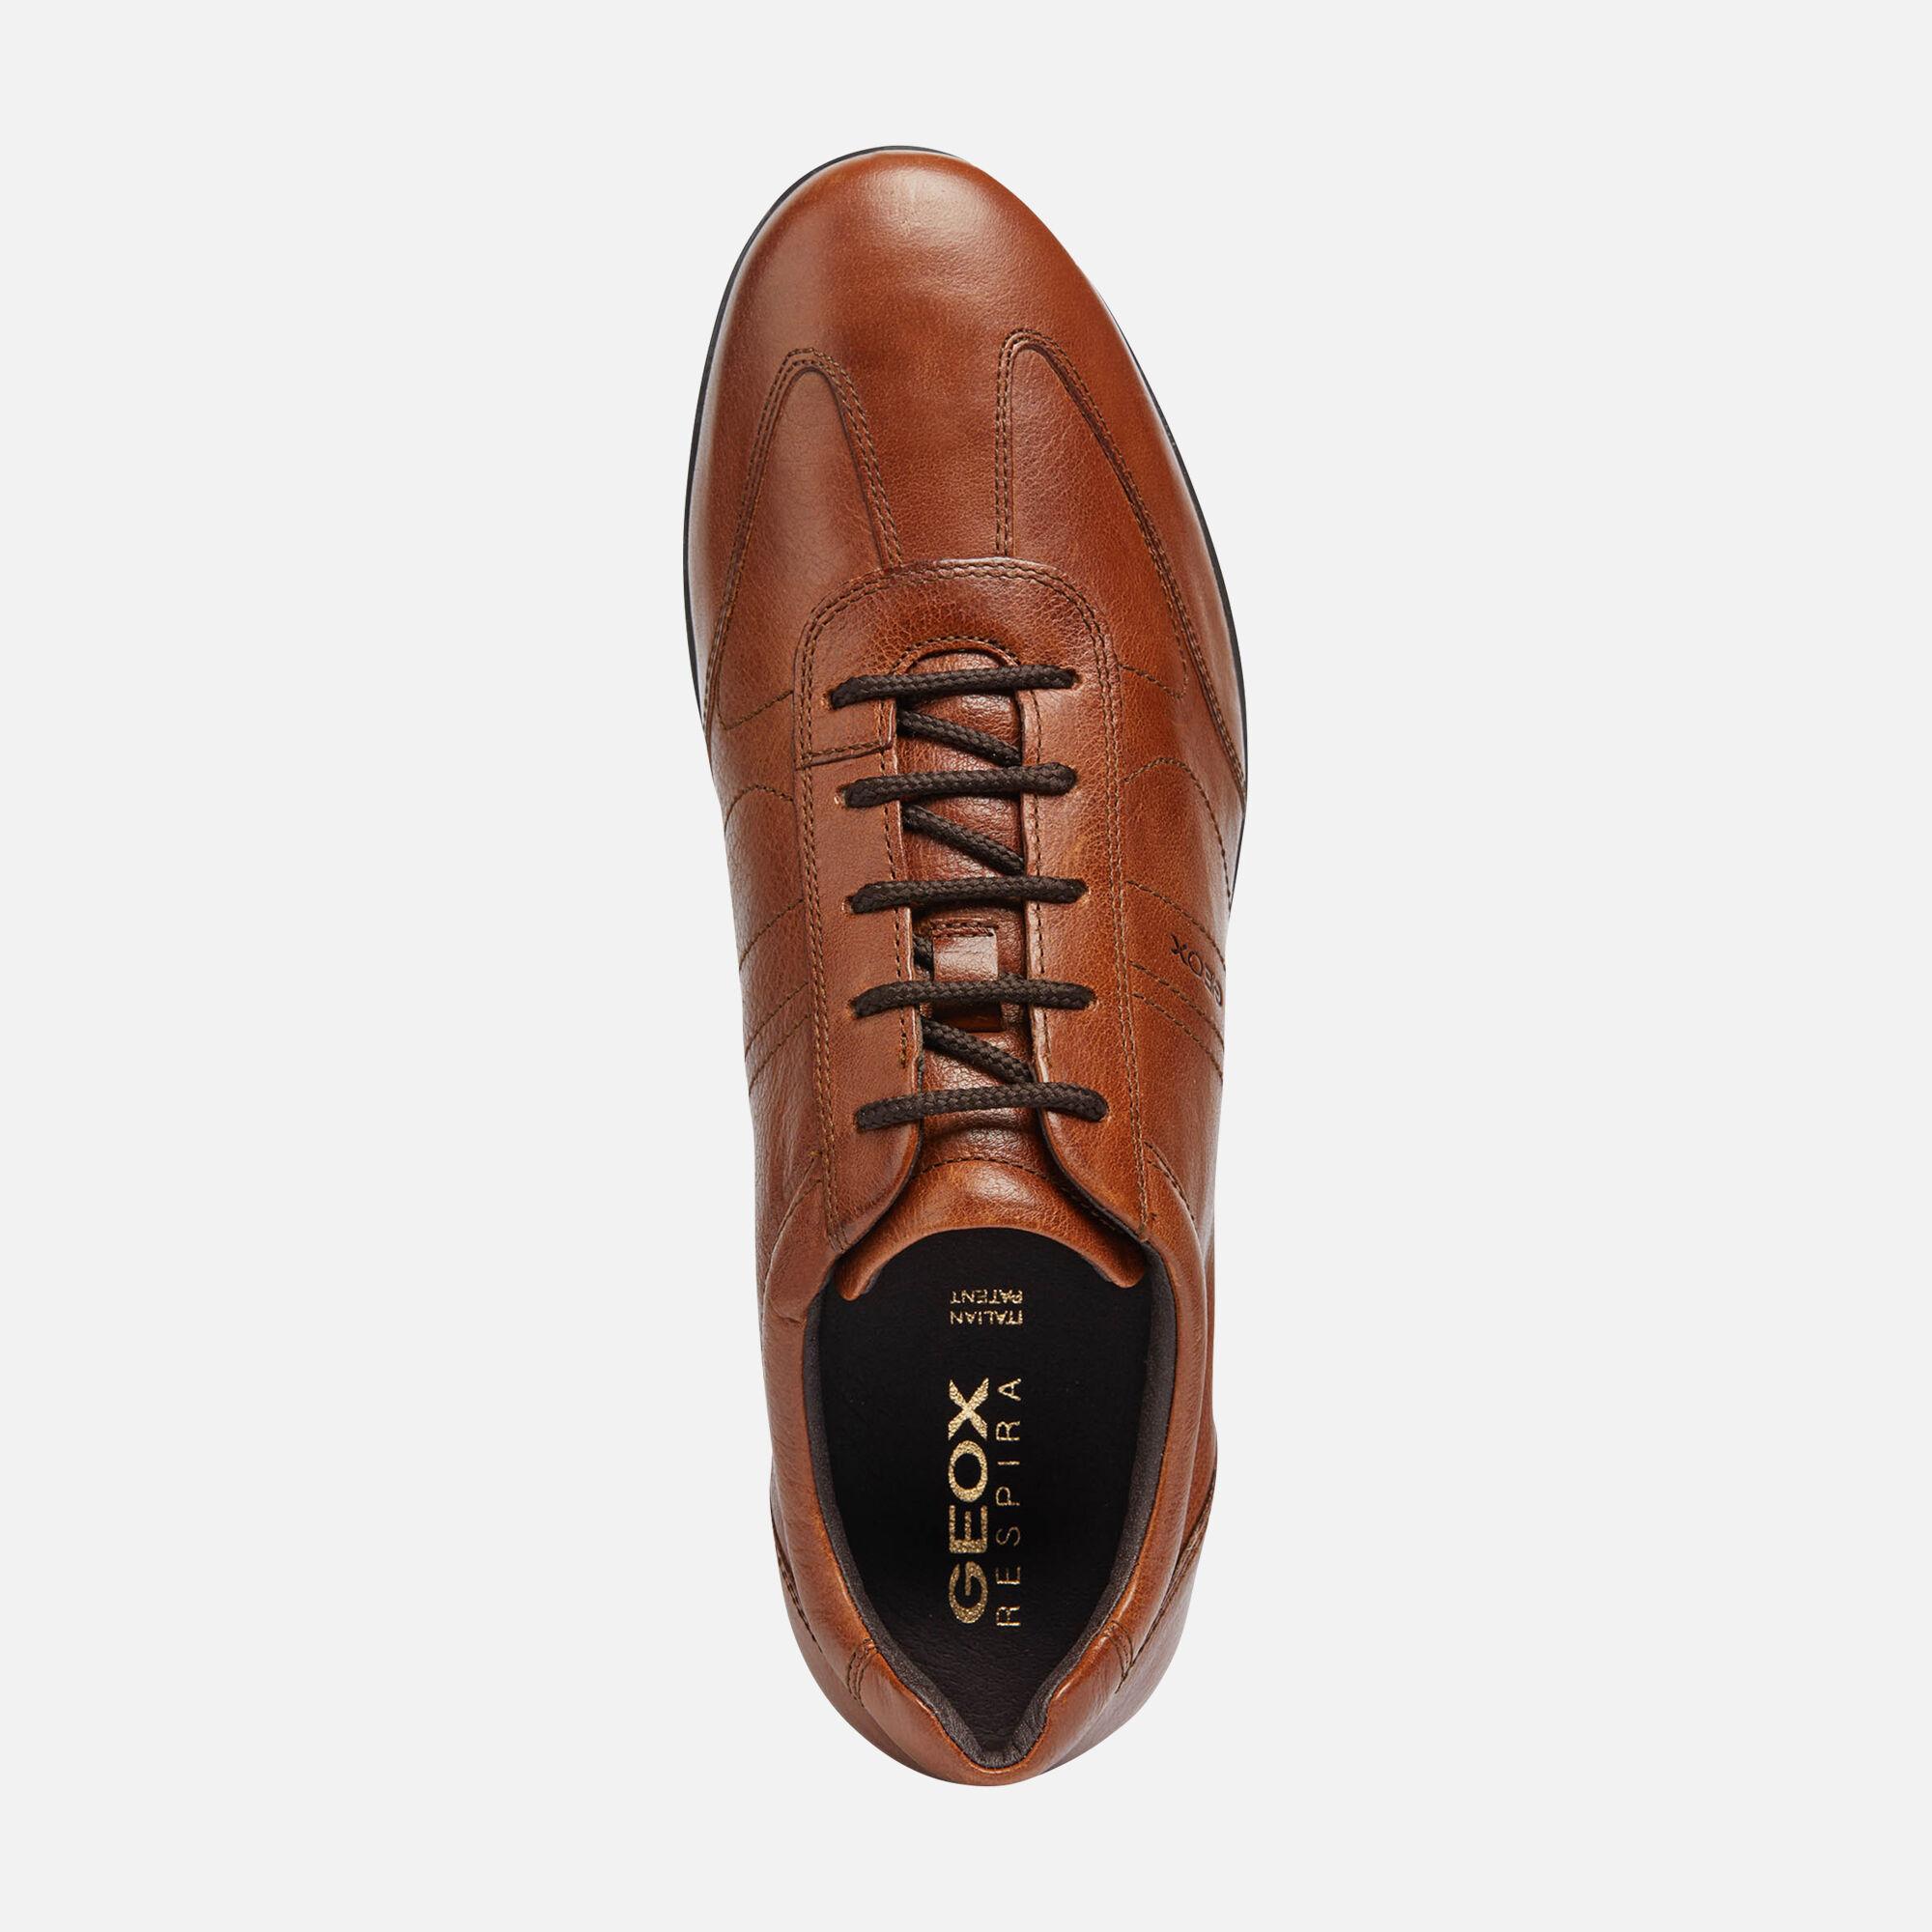 Geox UOMO SYMBOL Homme: Chaussures Marron brique   Geox® Store